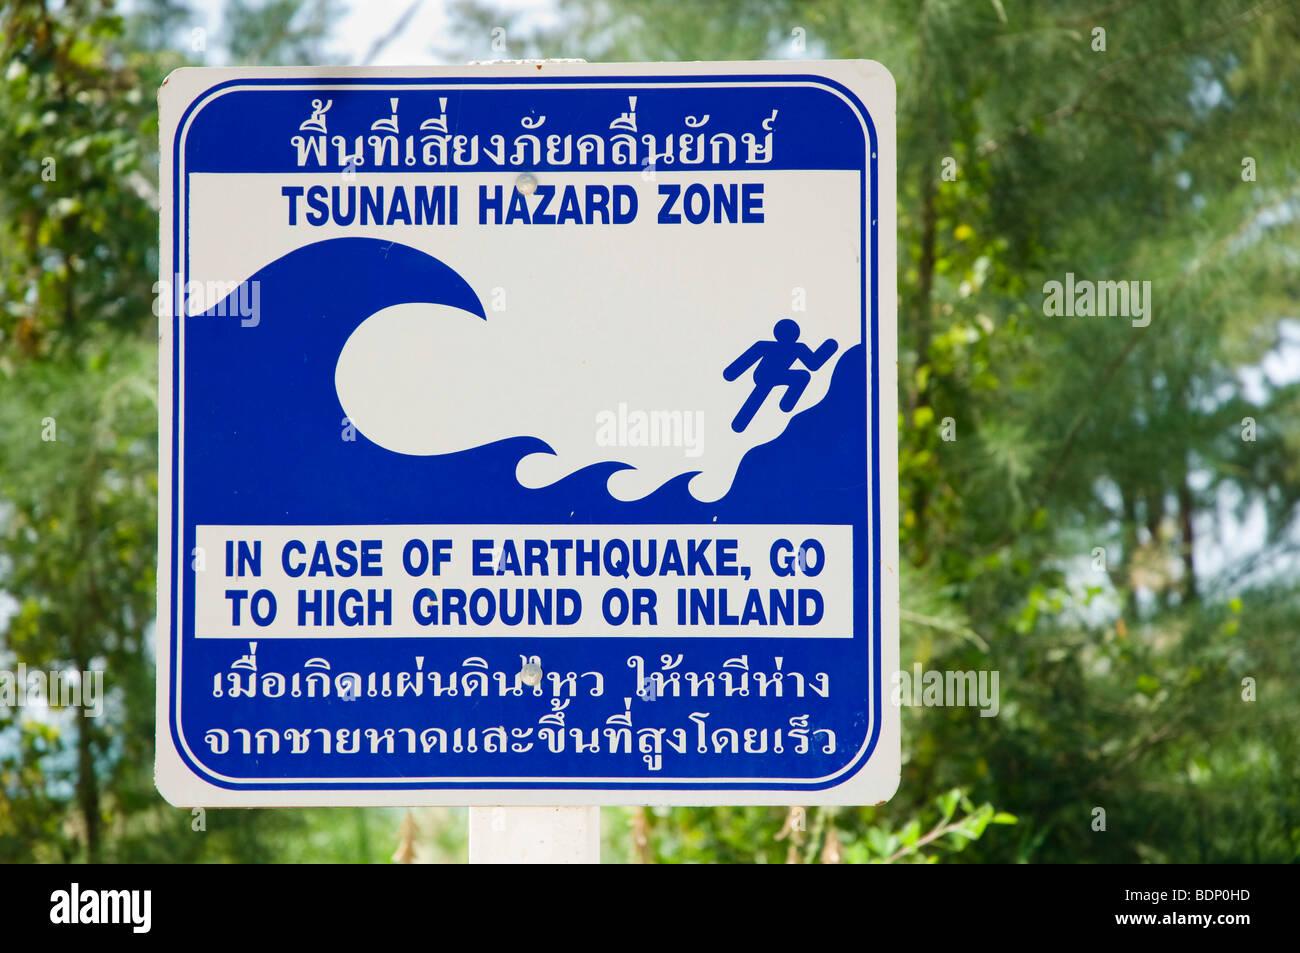 Tsunamivarning havd i thailand